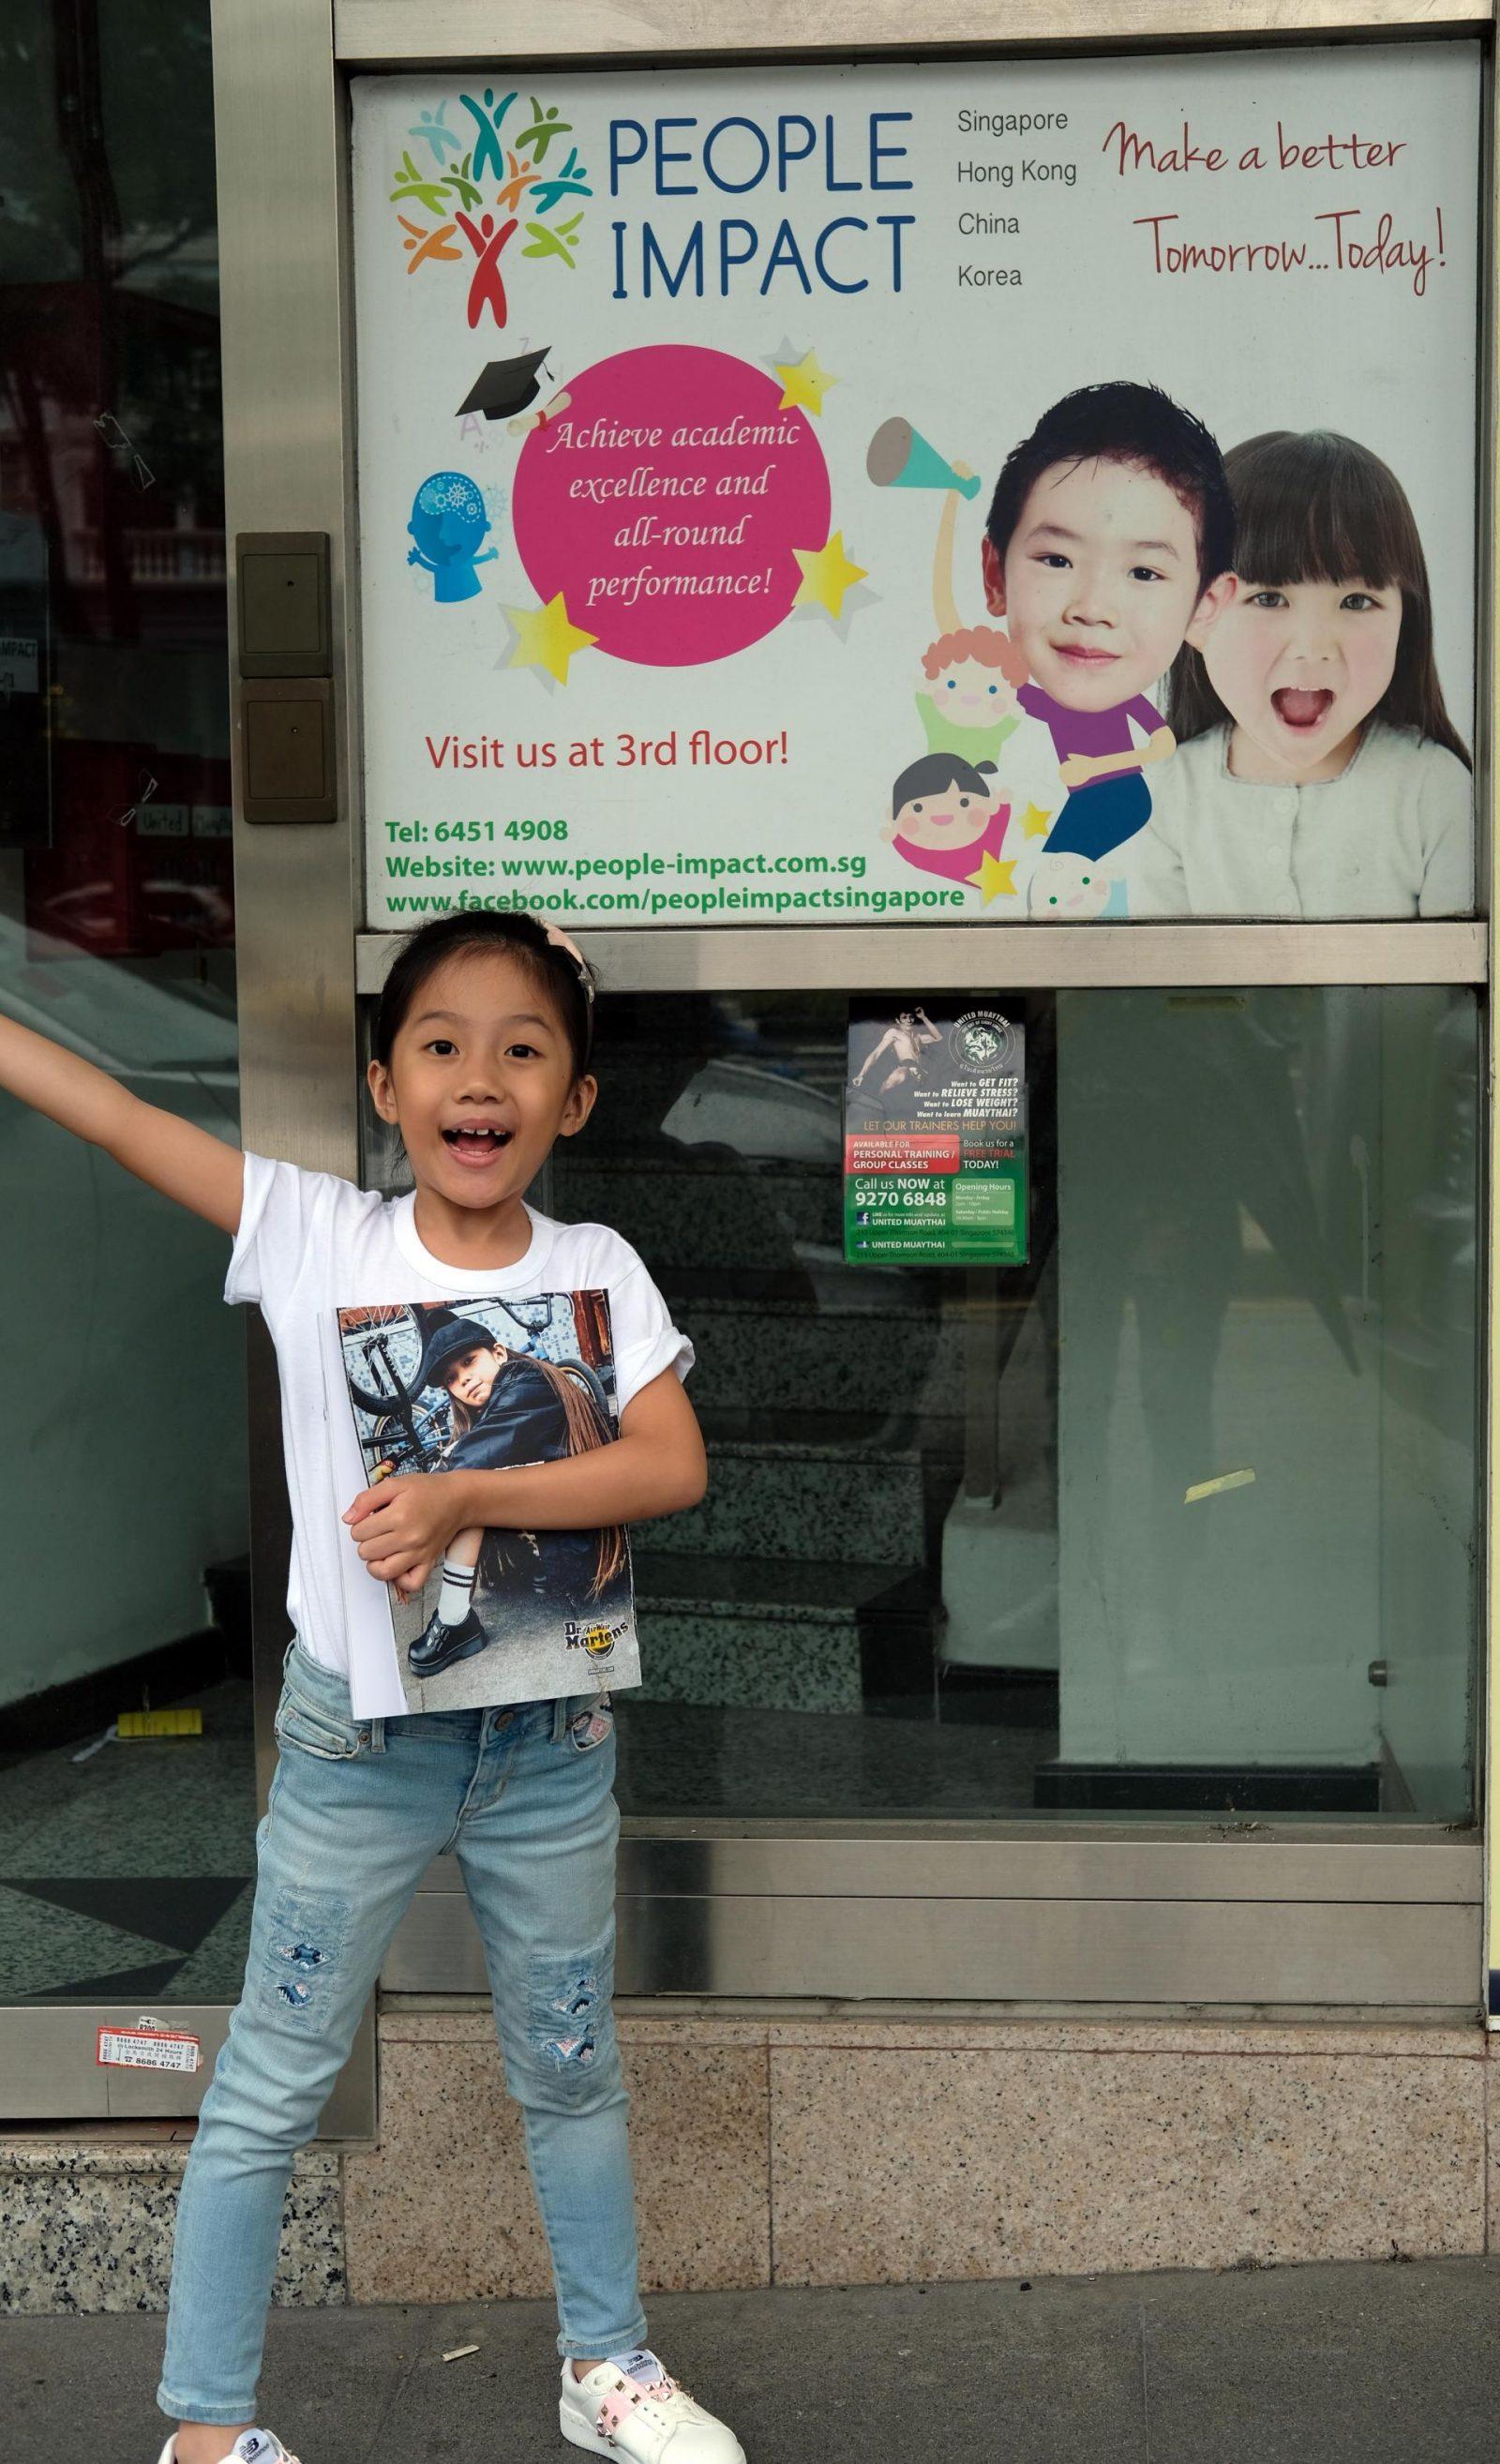 People Impact Singapore